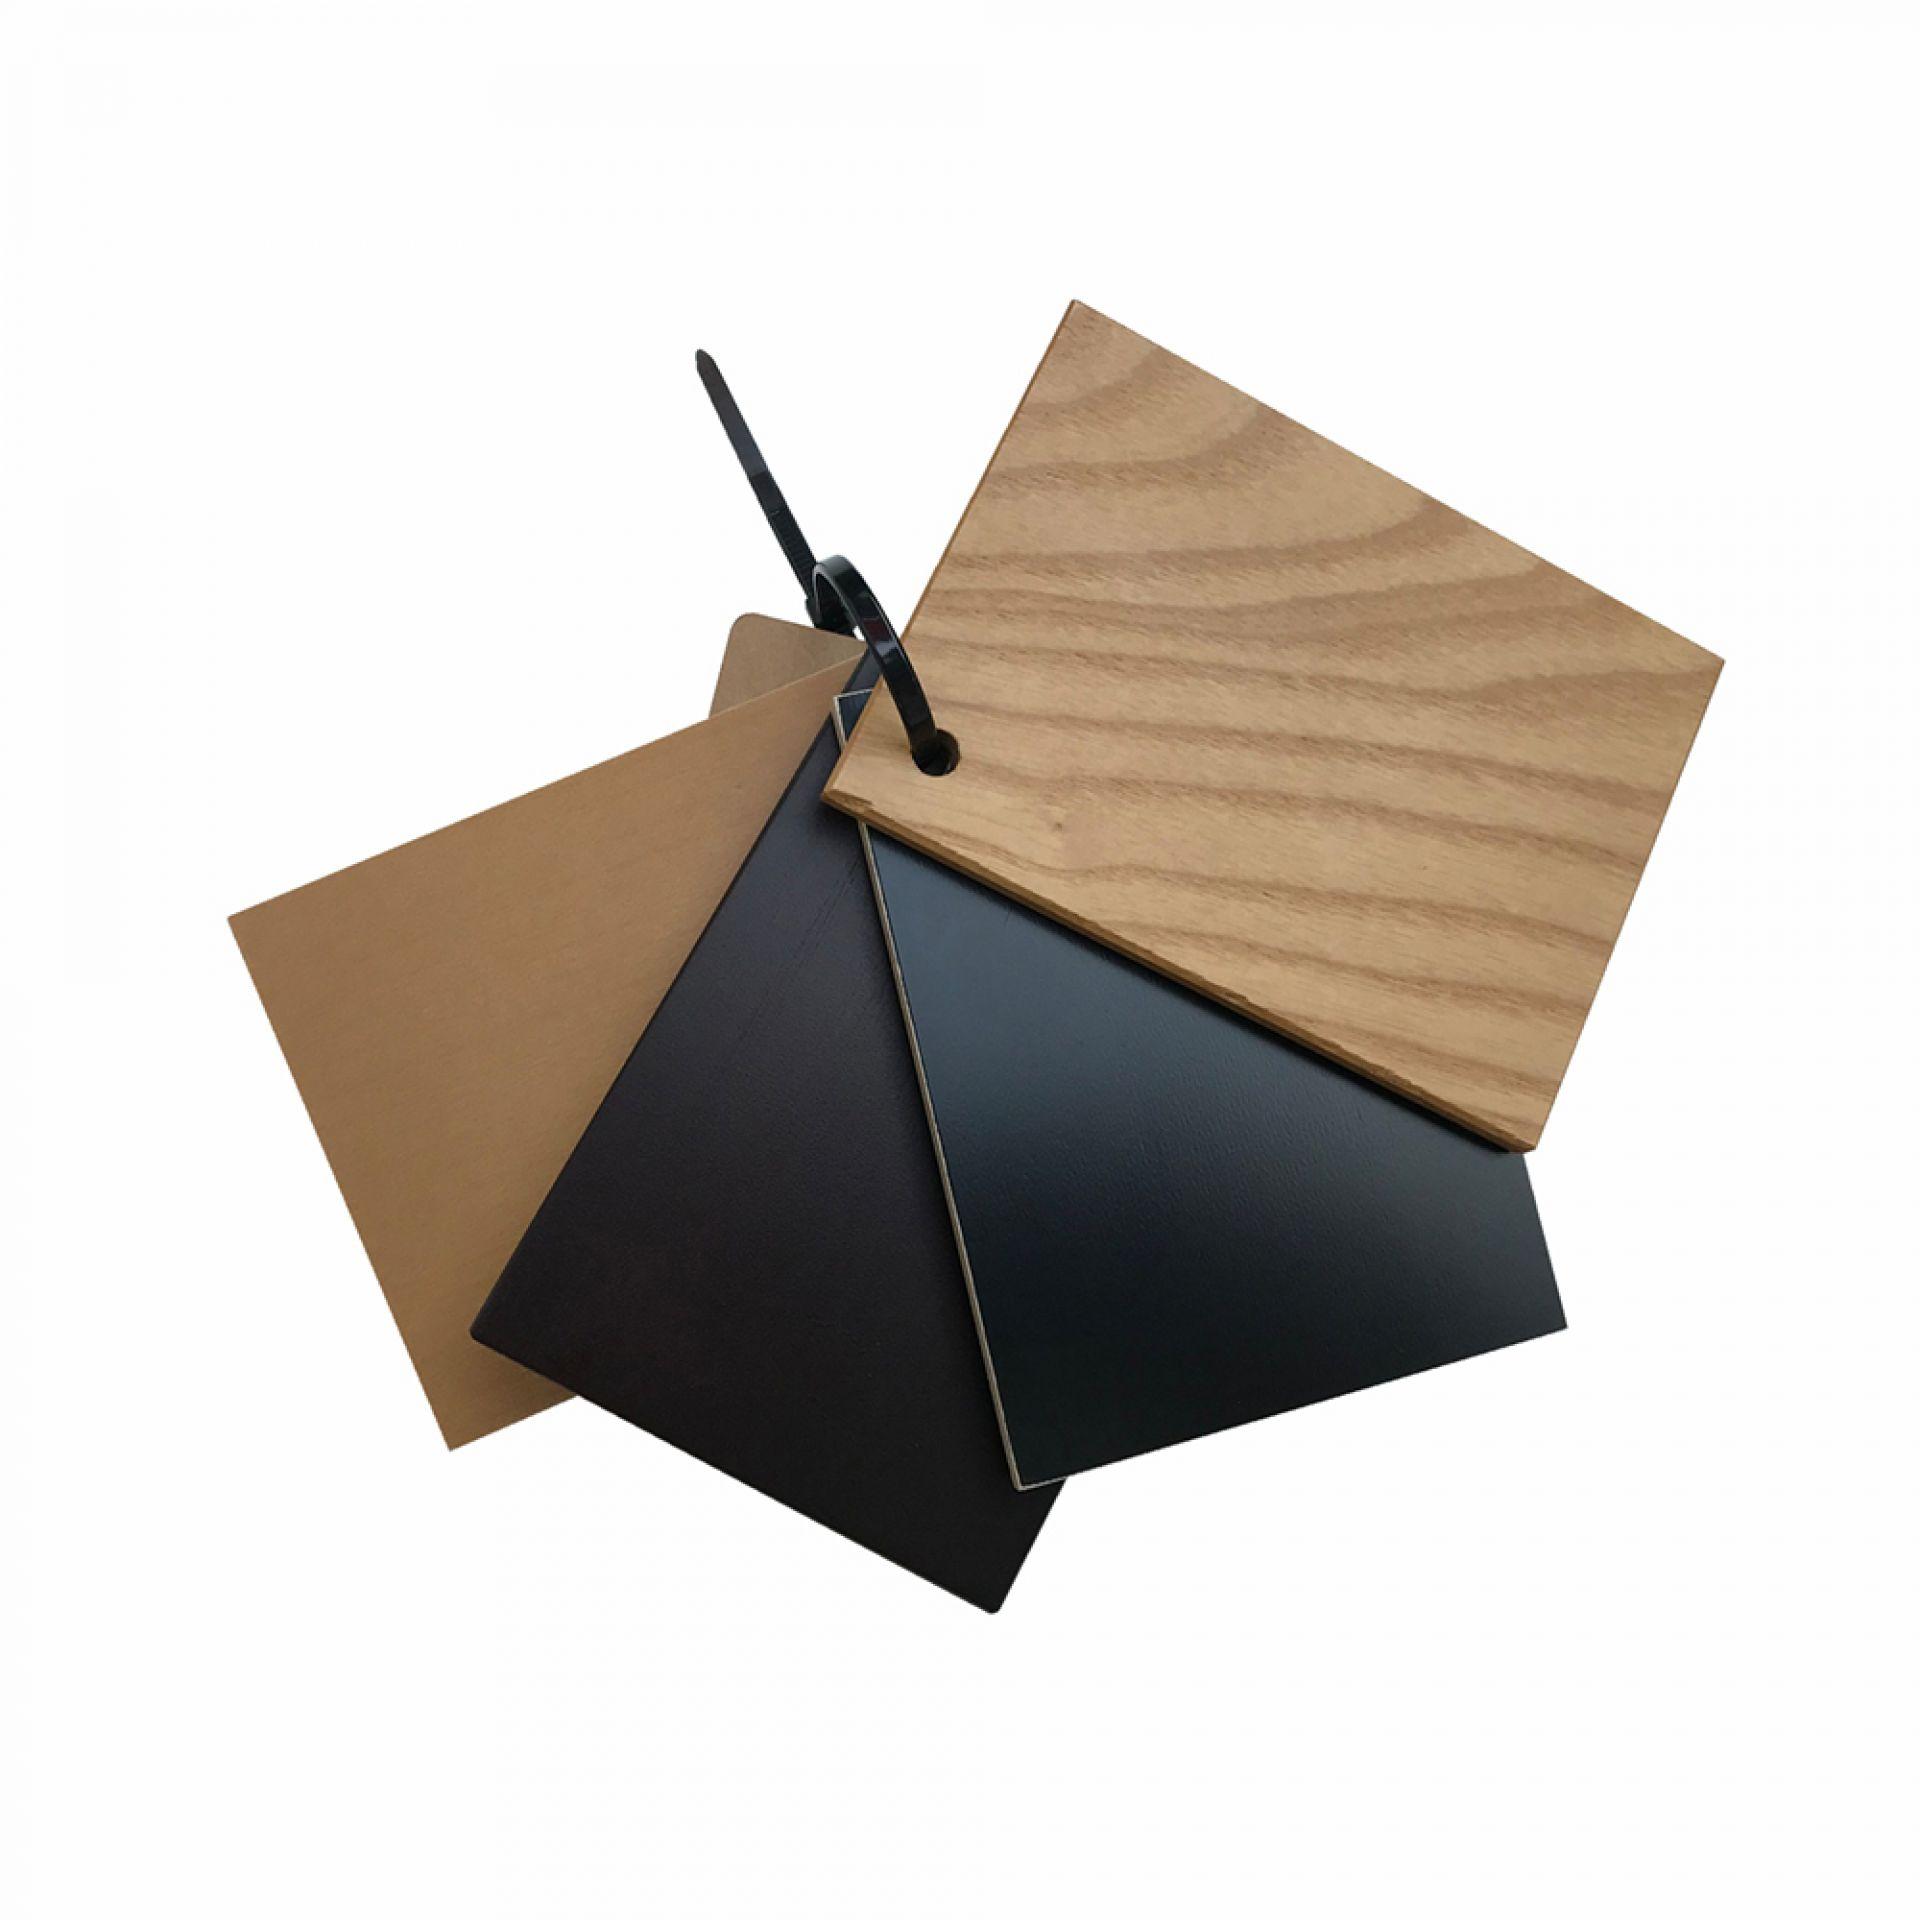 Holzmuster für Eames Plastic Chair DSW oder DAW Vitra